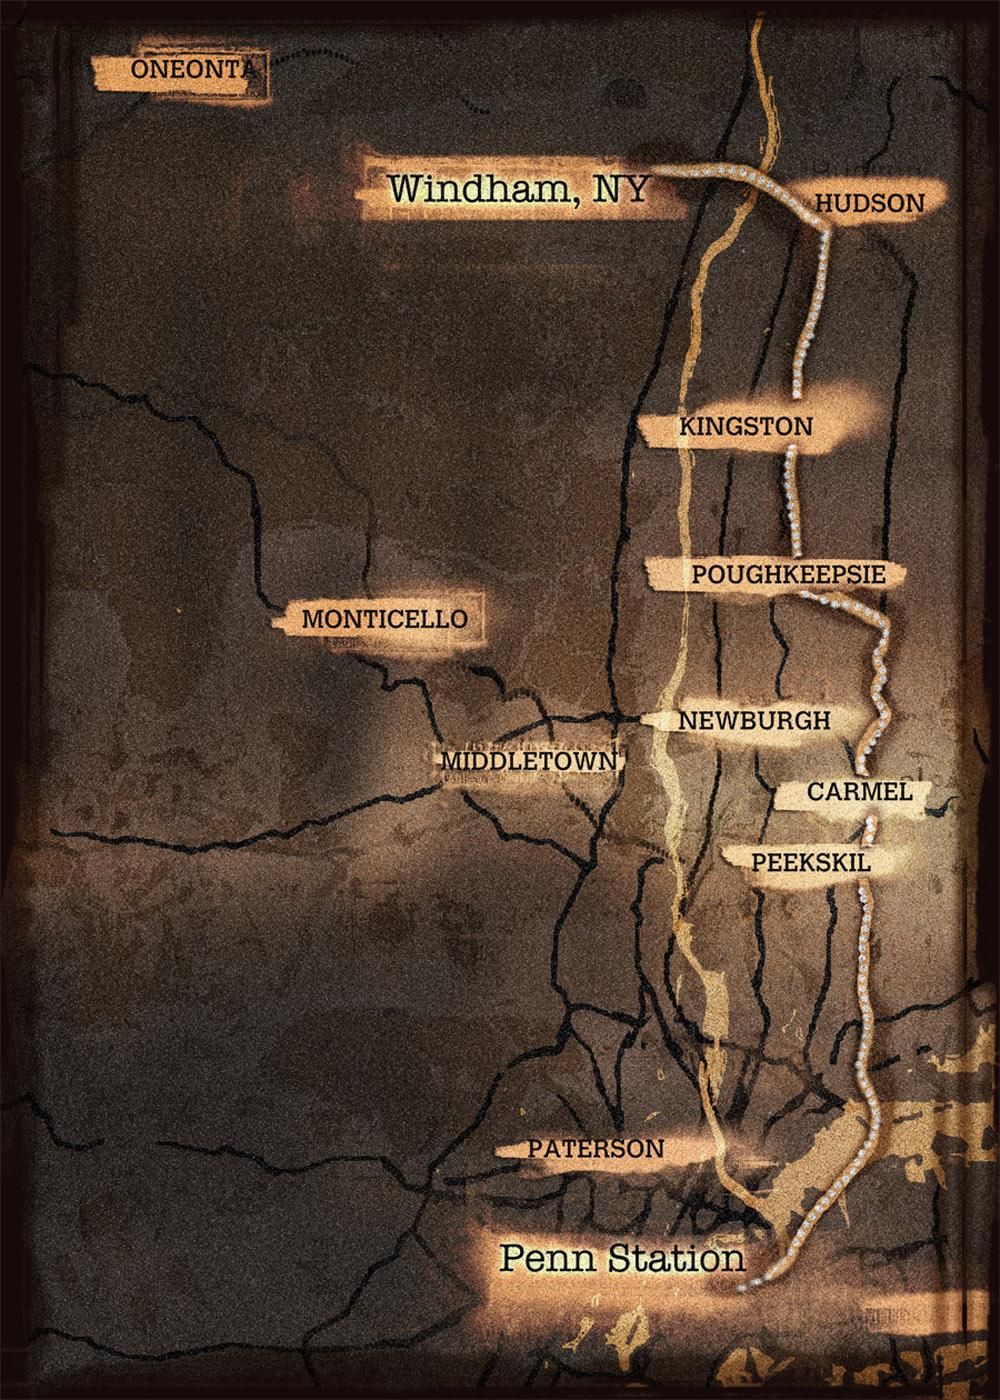 Post apocalyptic modern street map New York